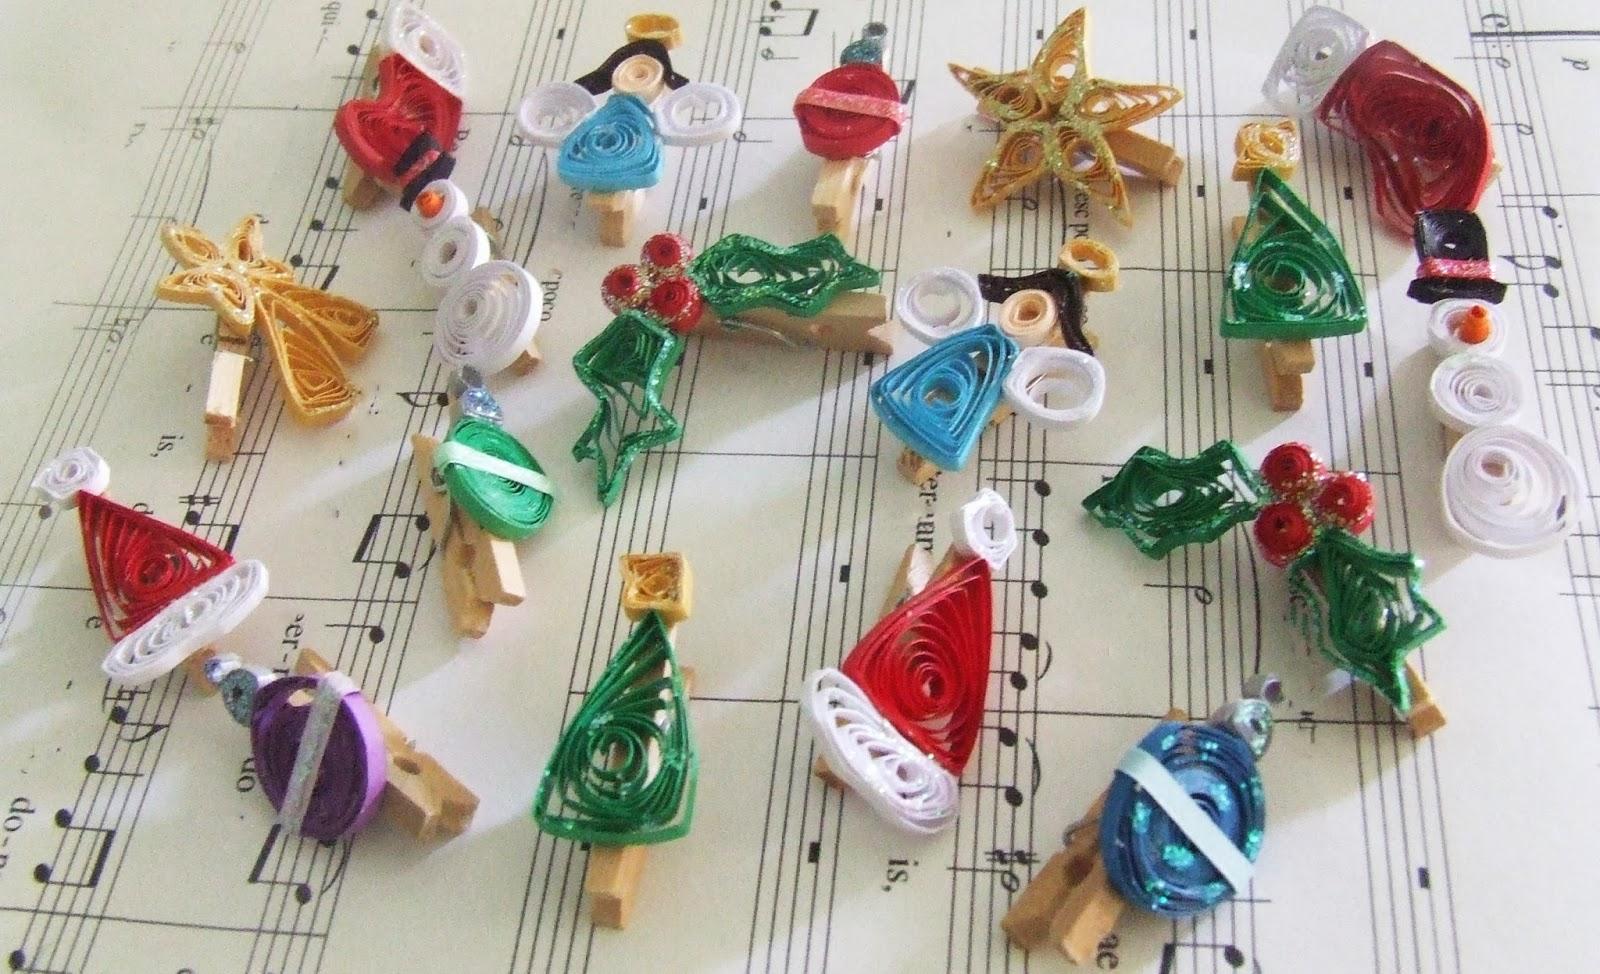 Polka Dot Parasol Designs: Week Fifty: Christmas Card Pegs